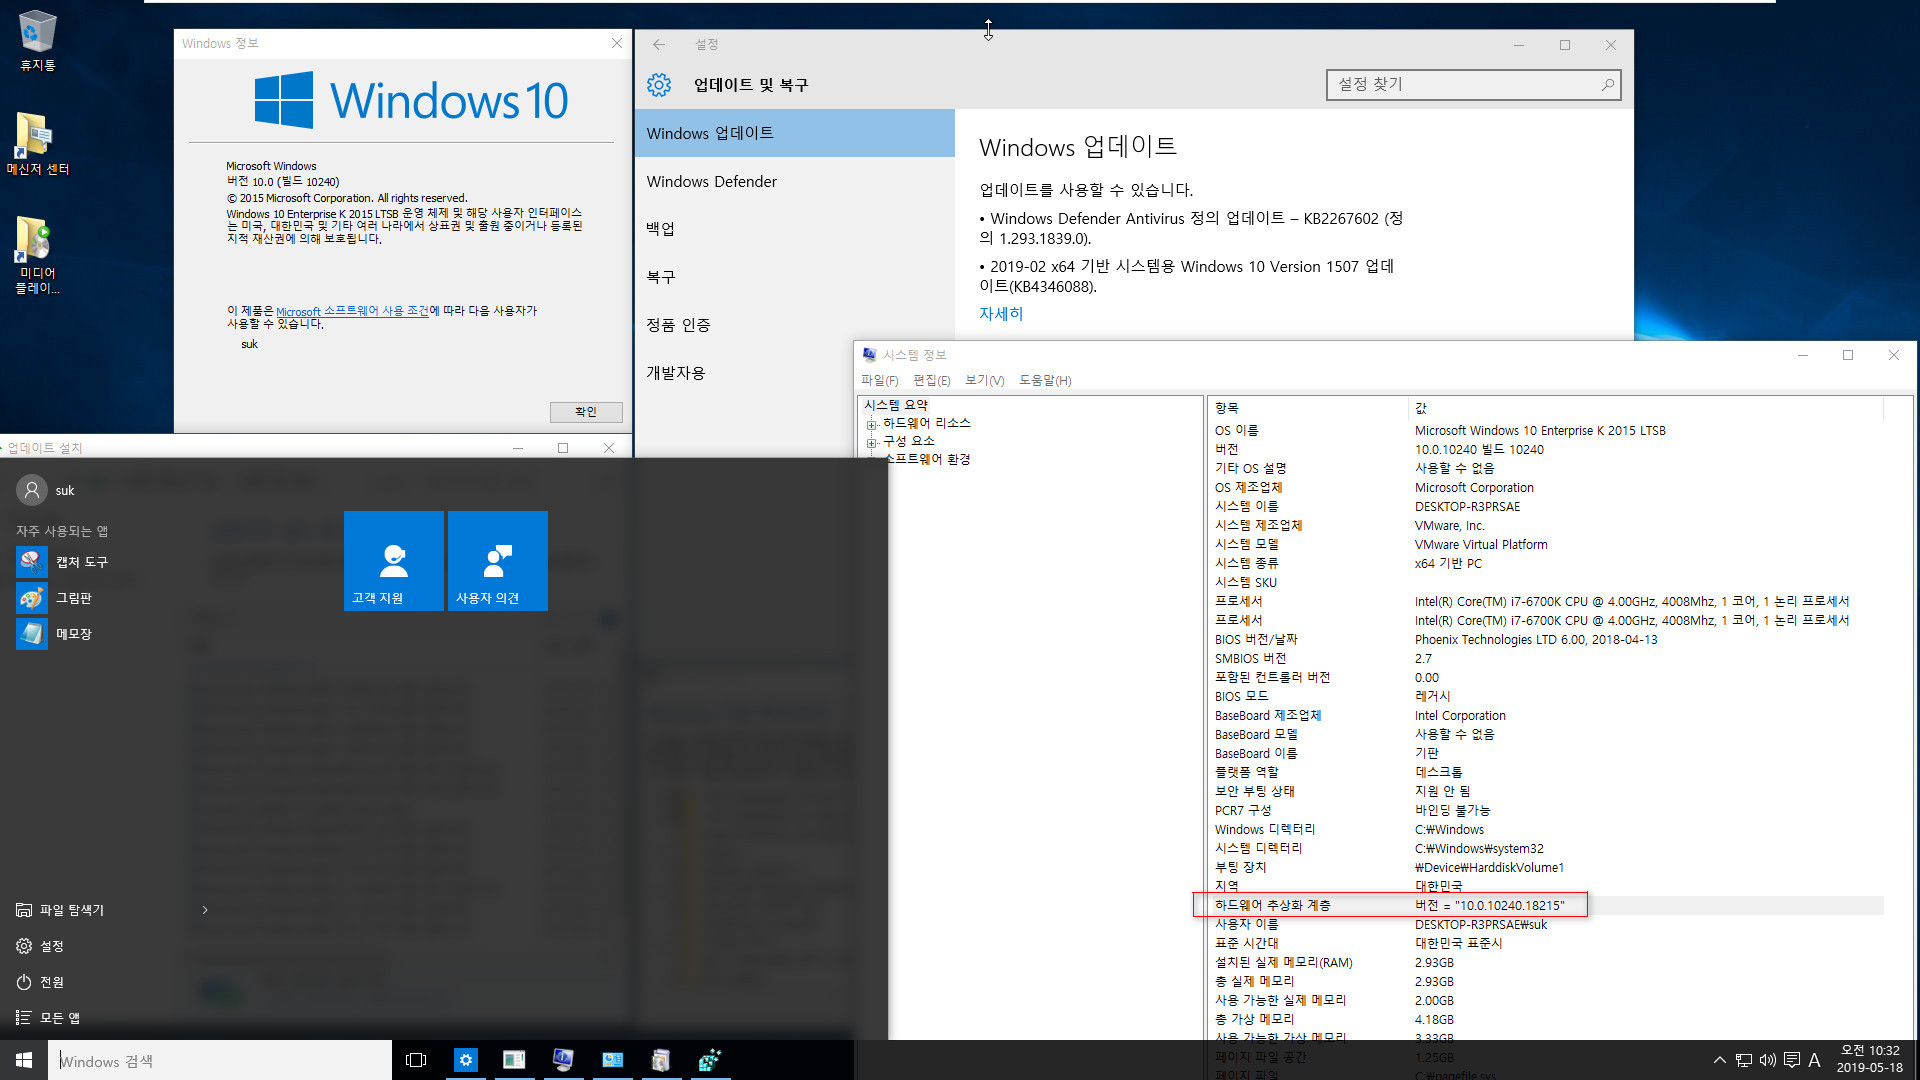 Windows 10 버전 1507용 누적 업데이트 KB4499154 (OS 빌드 10240.18215) [2019-05-14 일자] - 2015 LTSB만 통합중 입니다 2019-05-18_103243.jpg